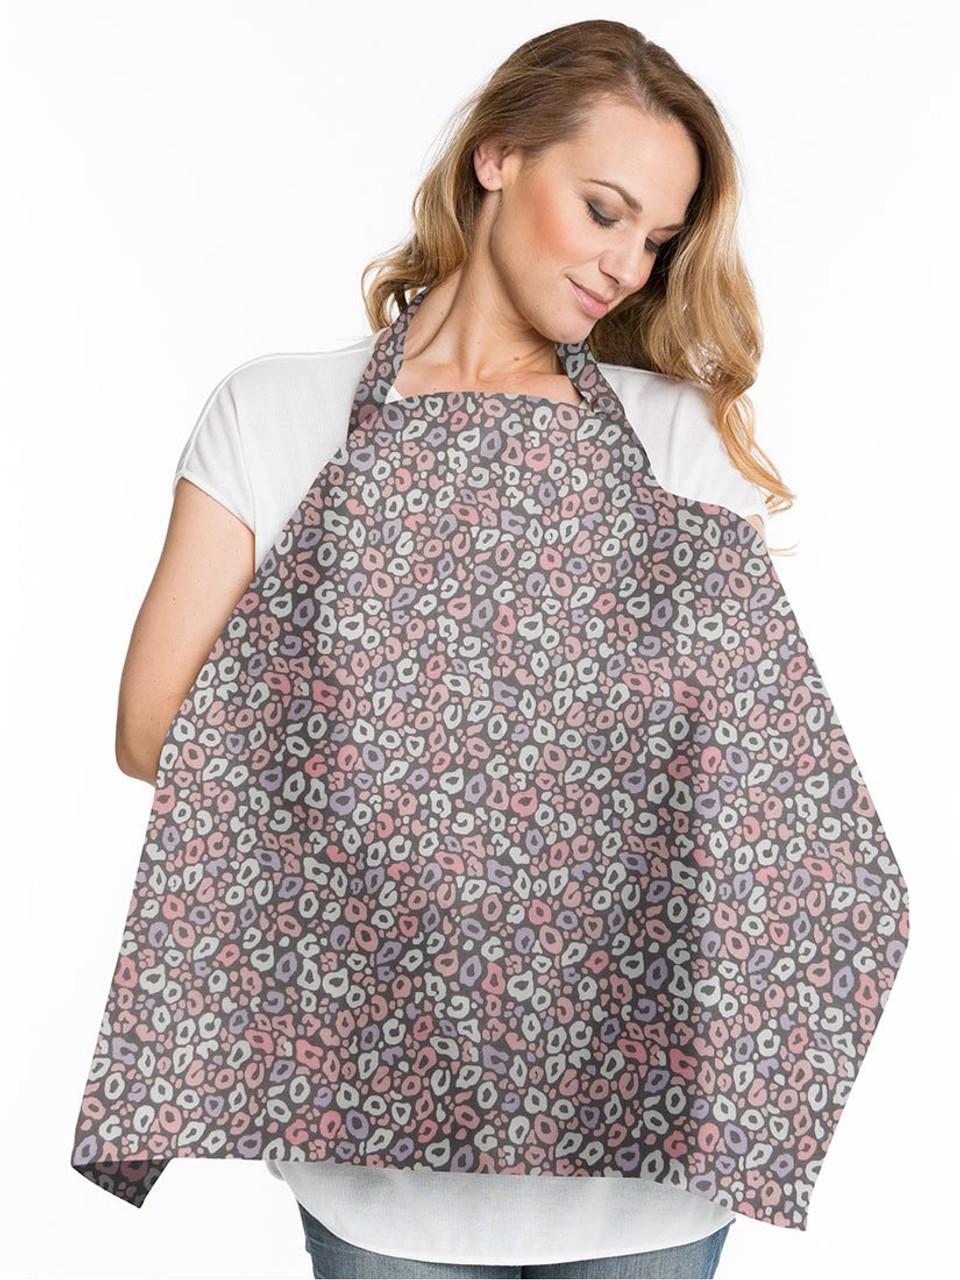 37 Breastfeeding cover,nursing covers,breastfeeding top,neck bone,cotton